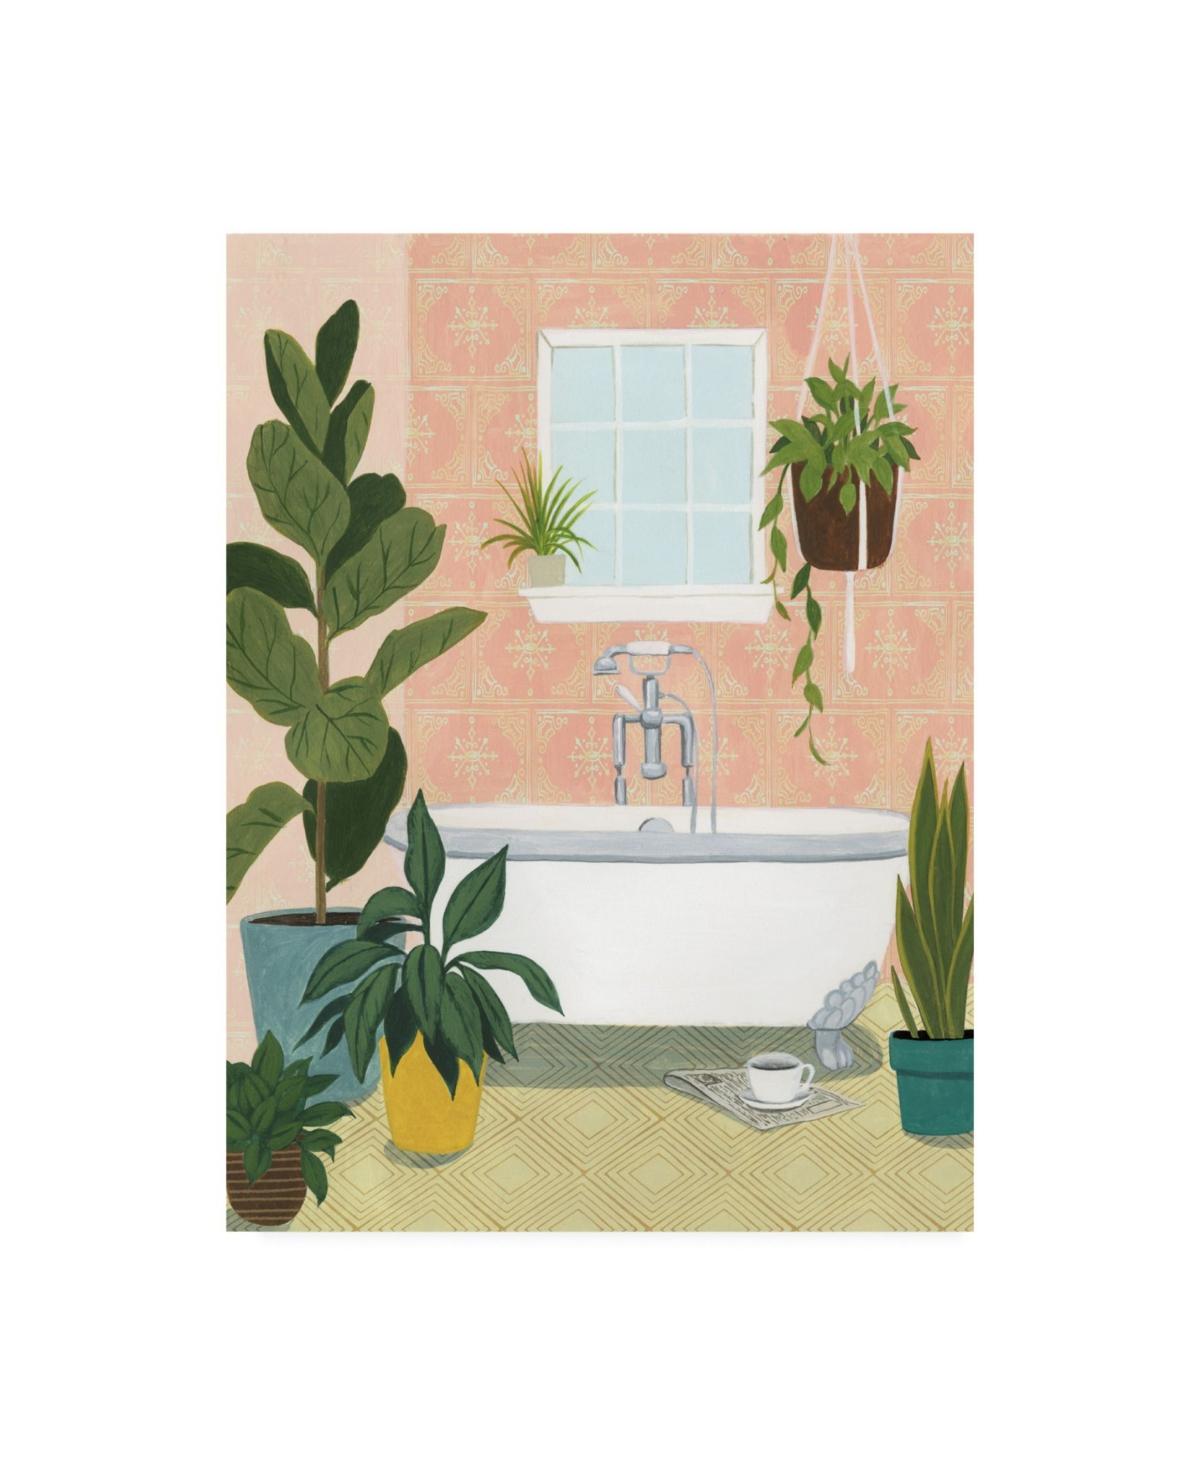 Grace Popp Bathtub Oasis Ii Canvas Art - 36.5